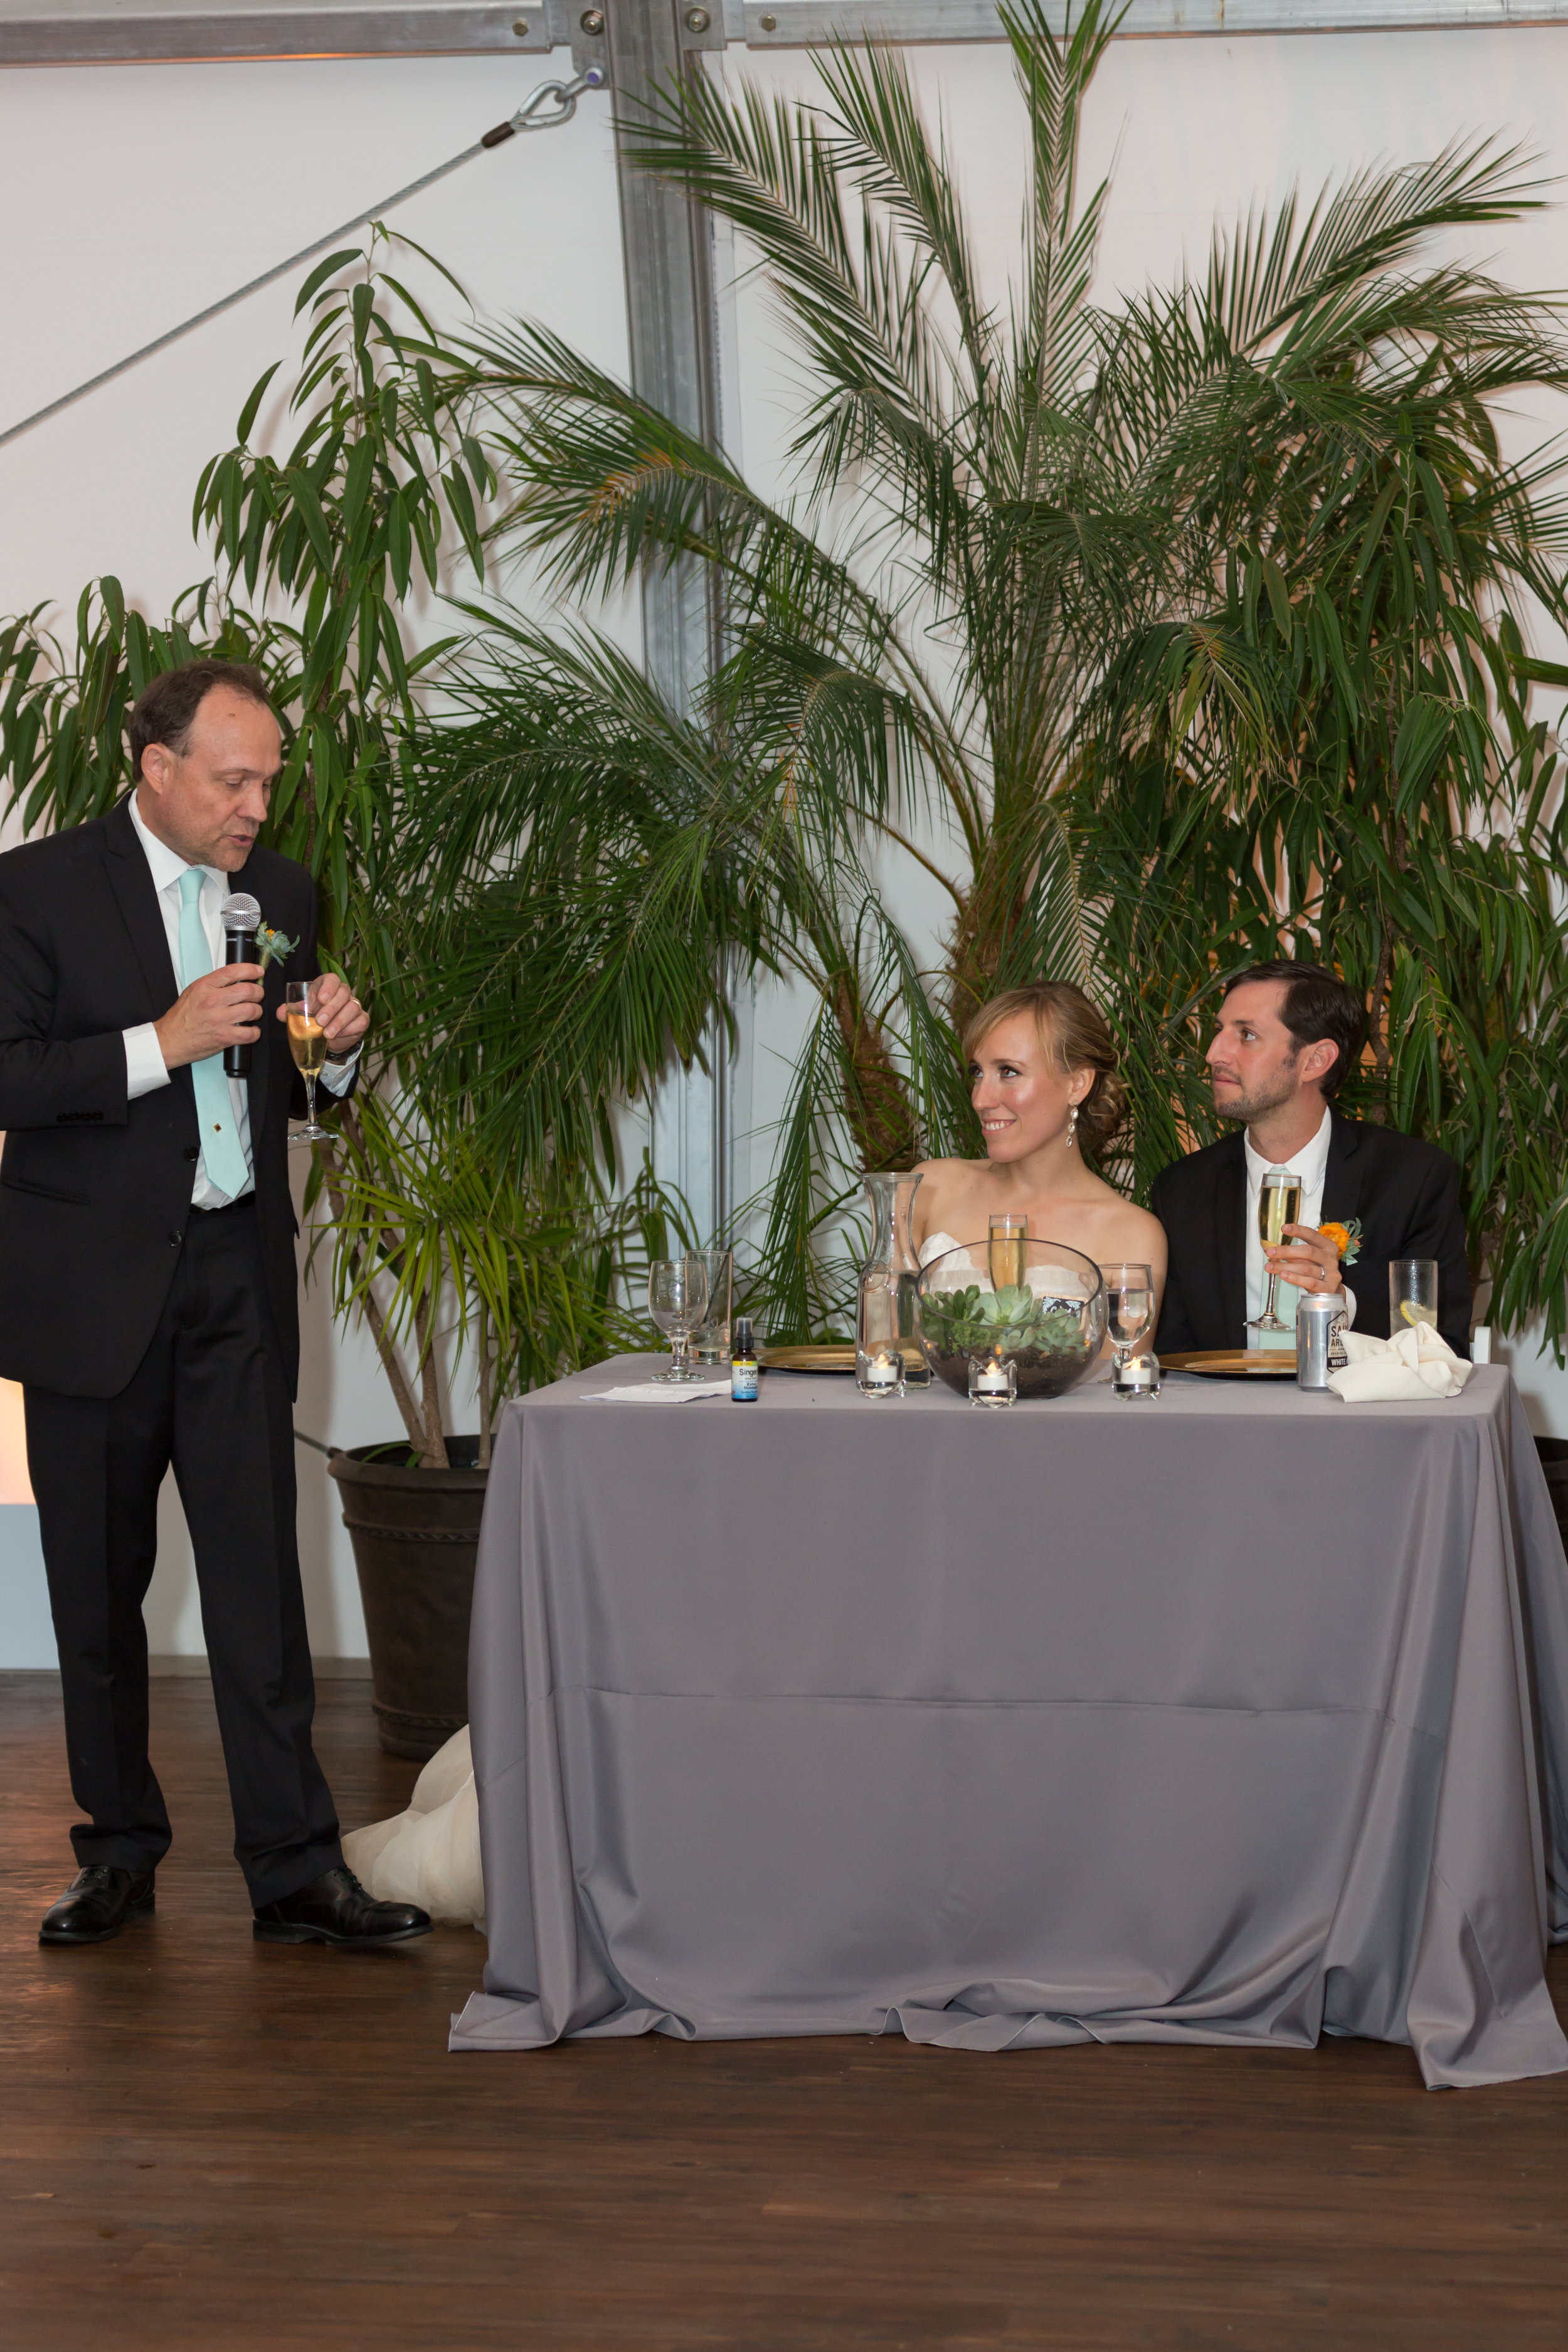 San-Francisco-Wedding-73.jpg